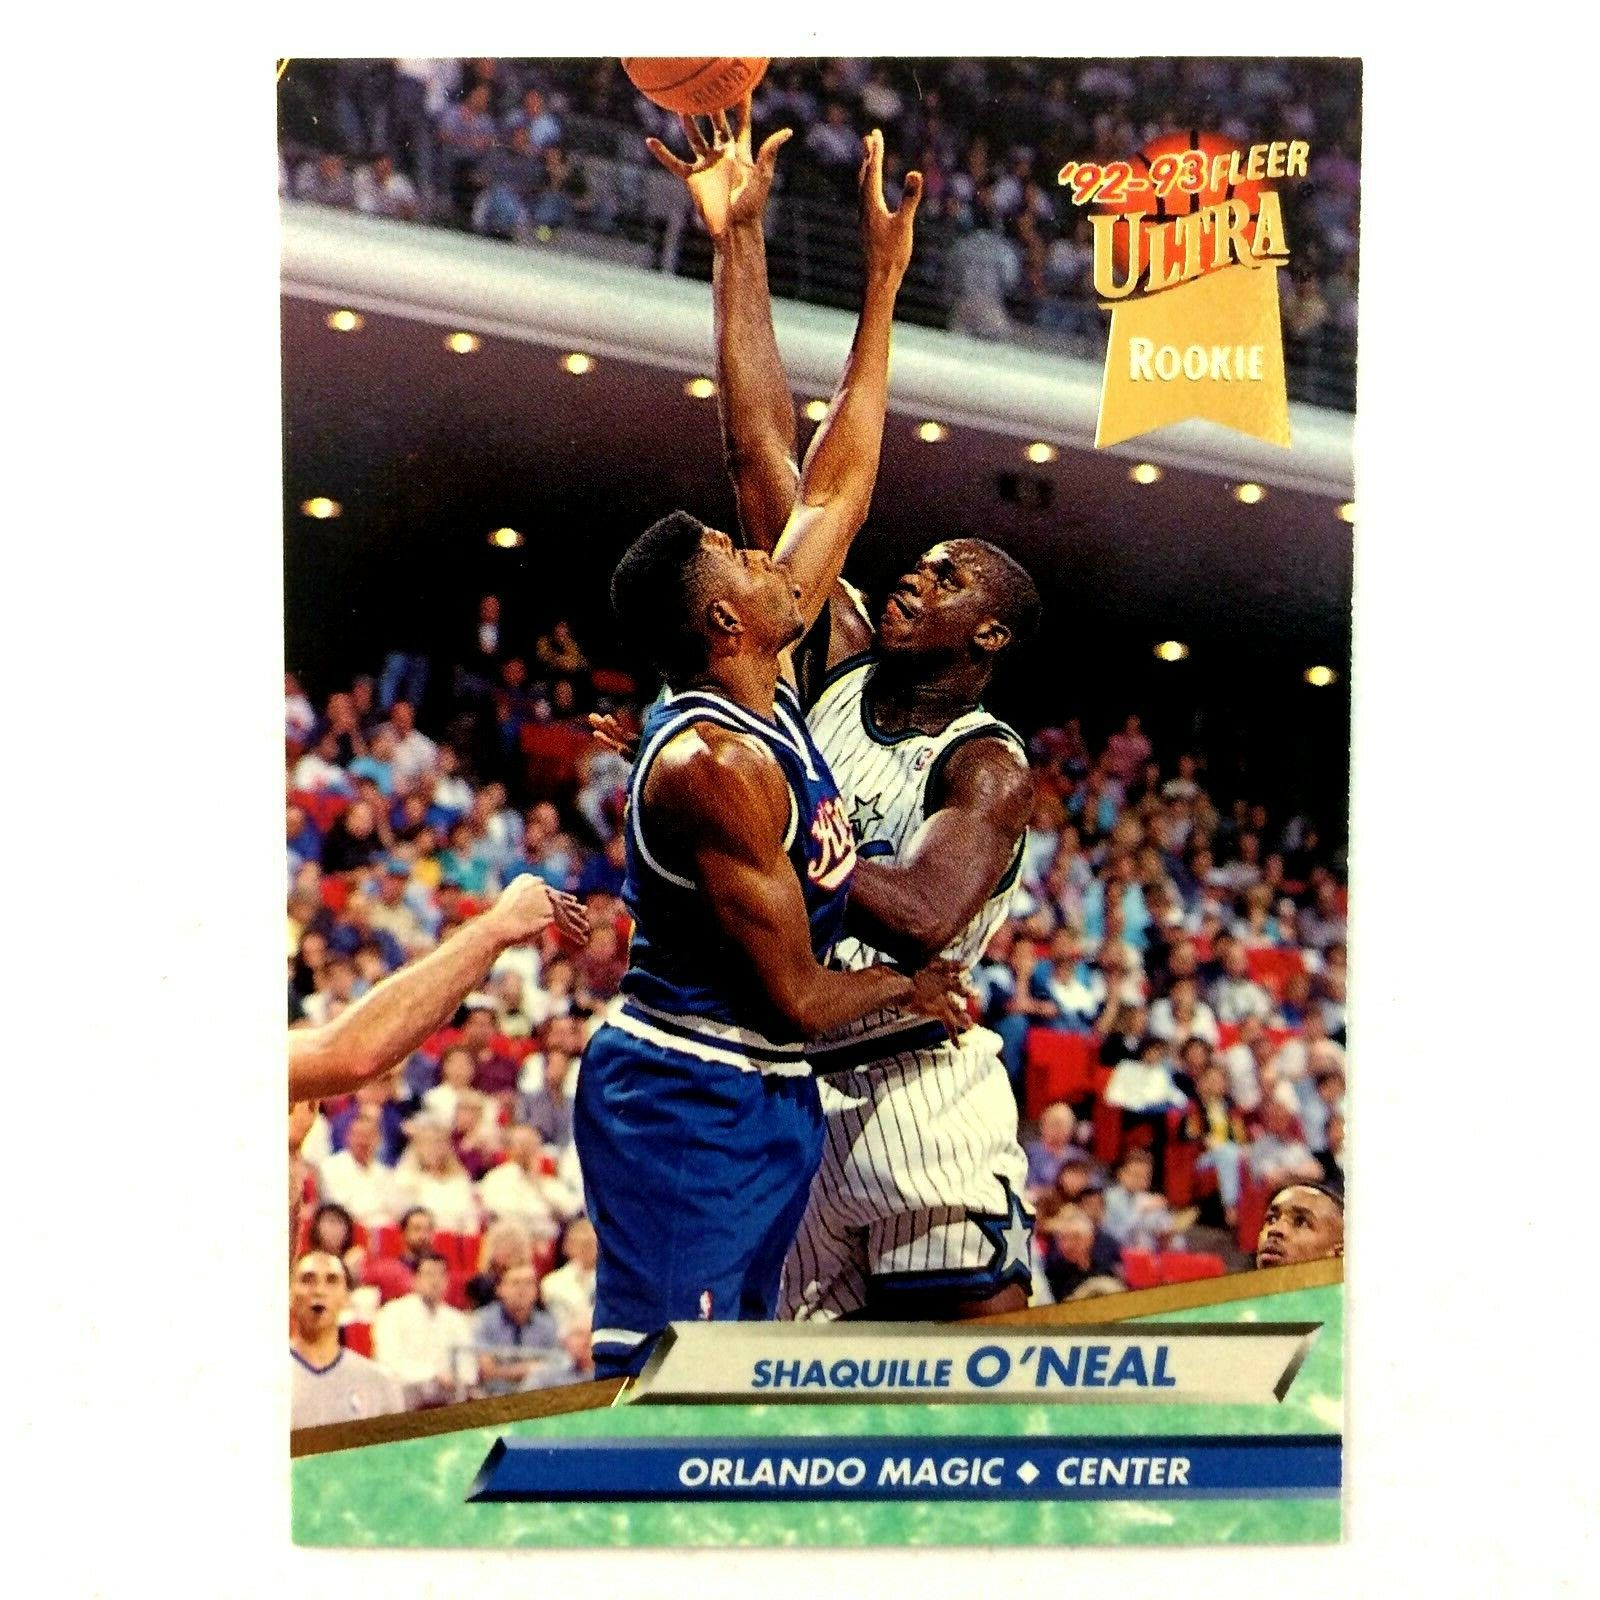 Shaquille O'Neal 1992-93 Fleer Ultra Rookie Card #328 NBA HOF Magic - $7.87